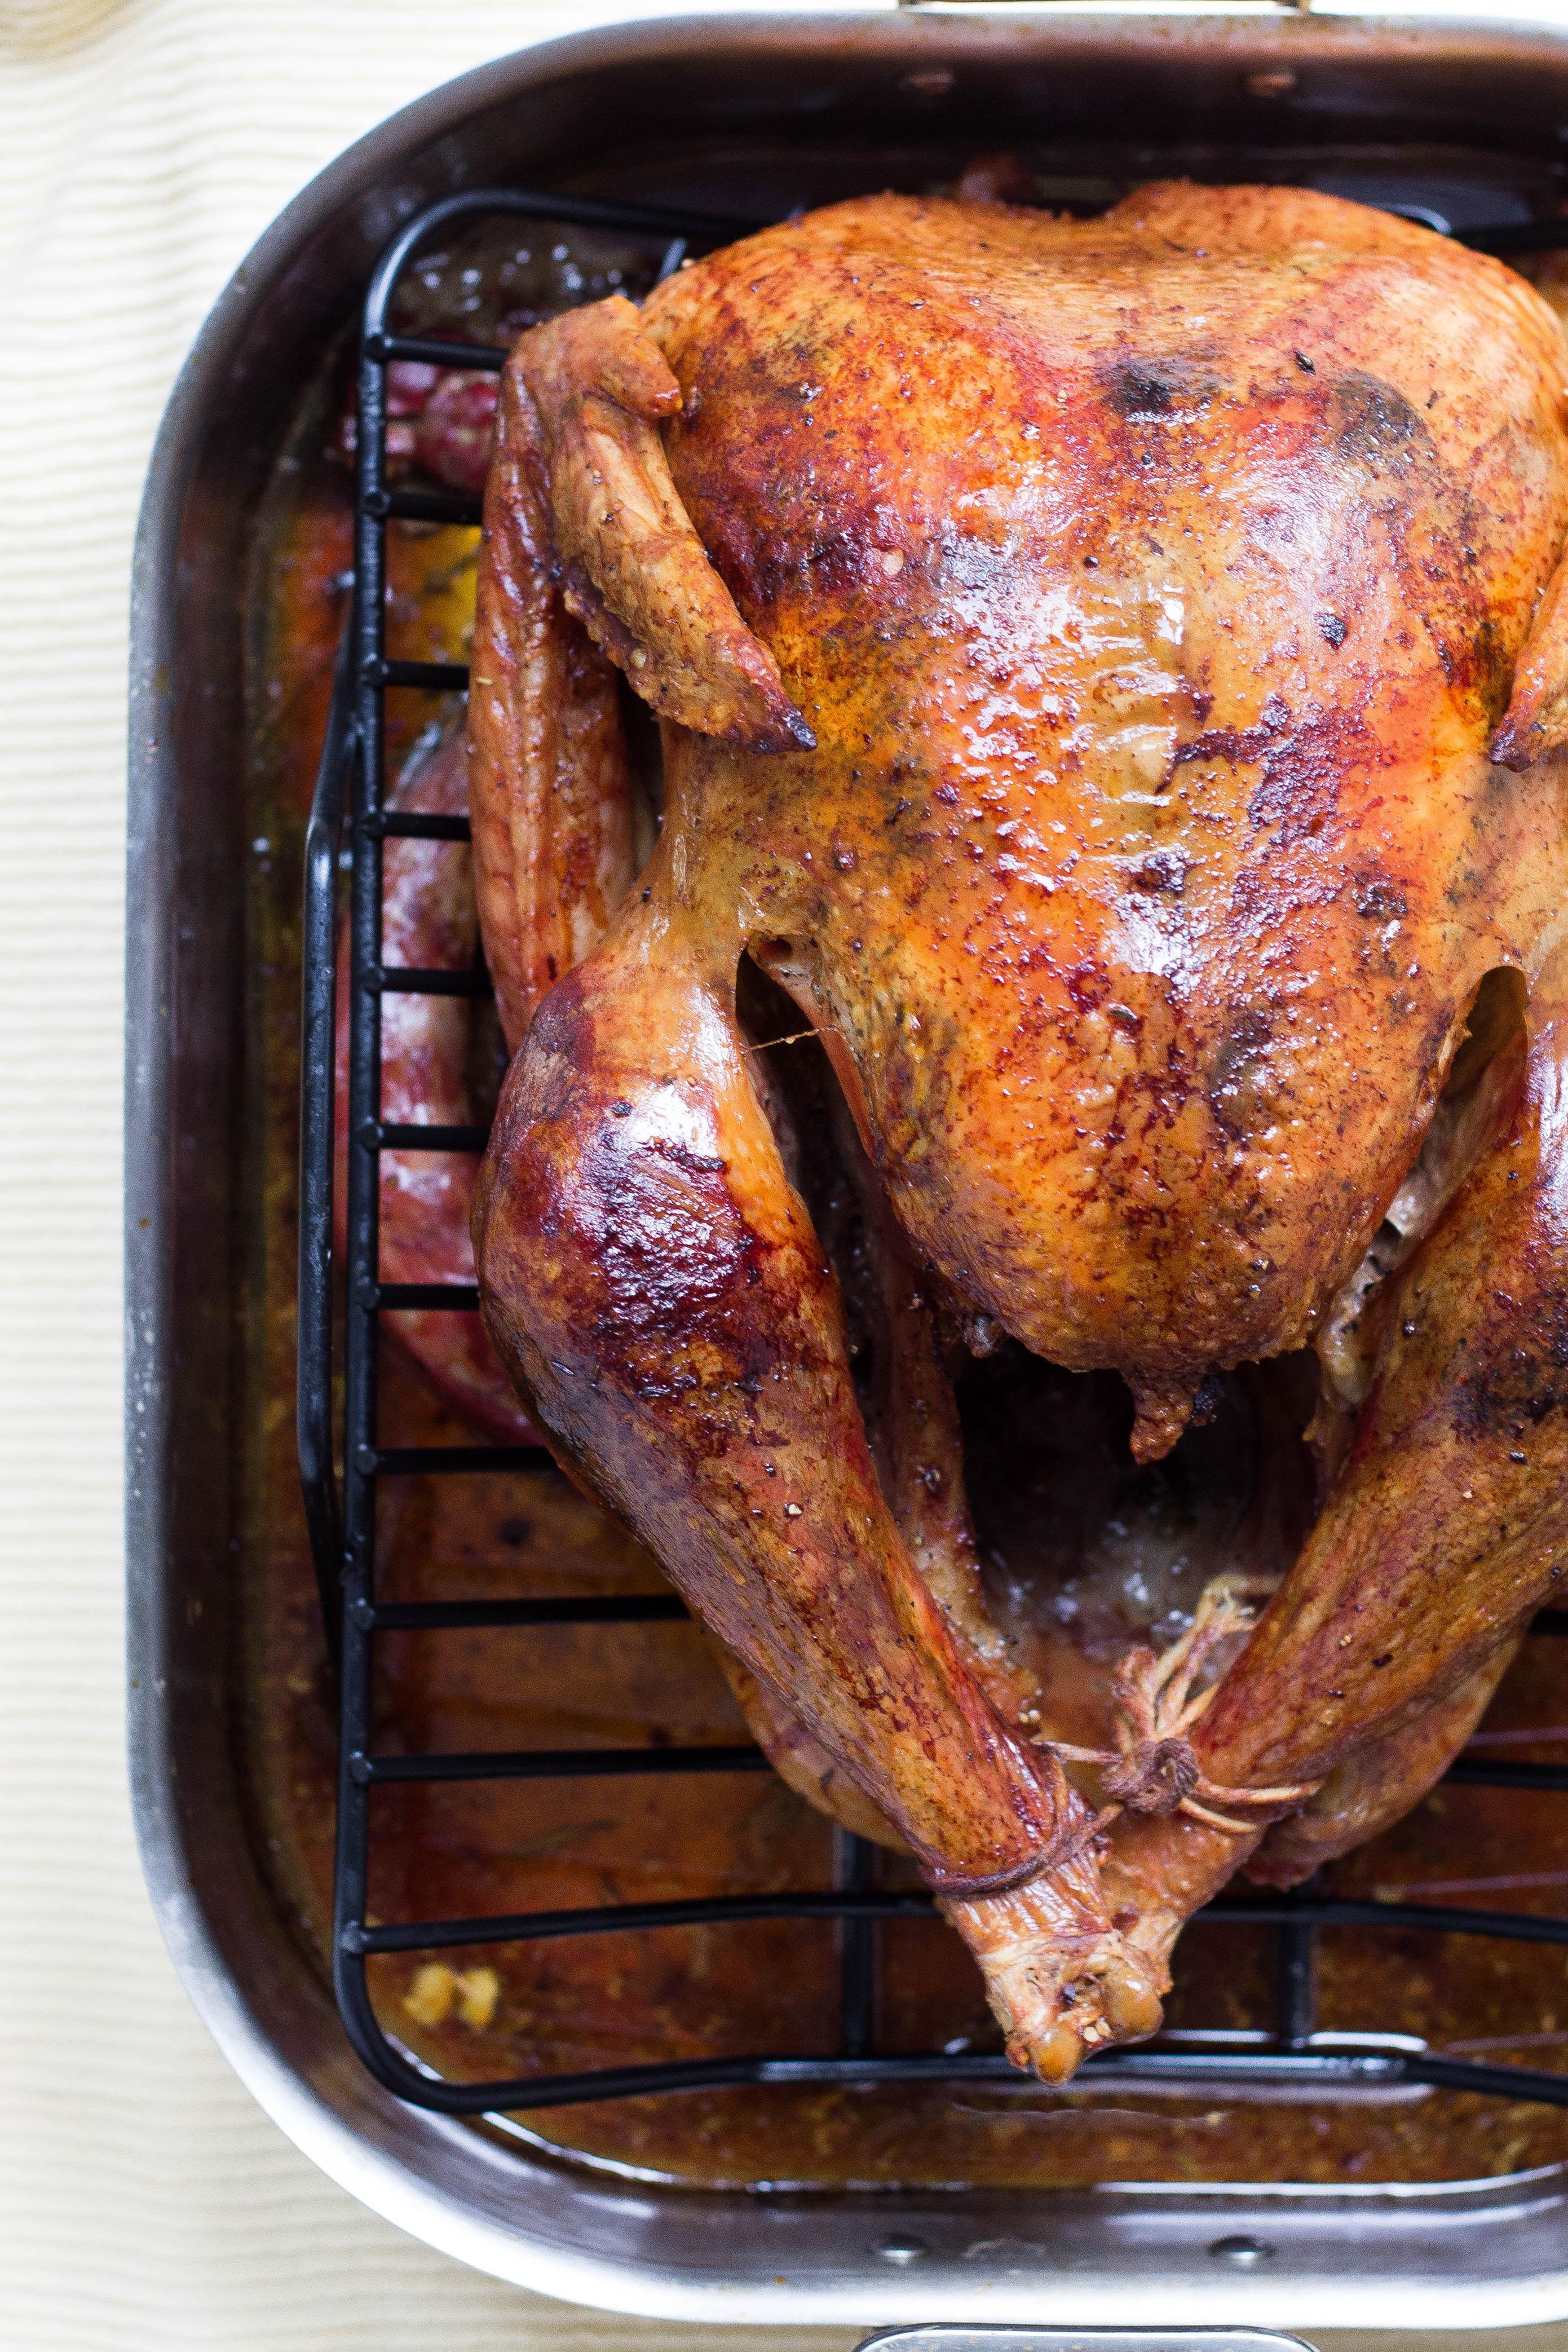 roasted turkey sitting in pan